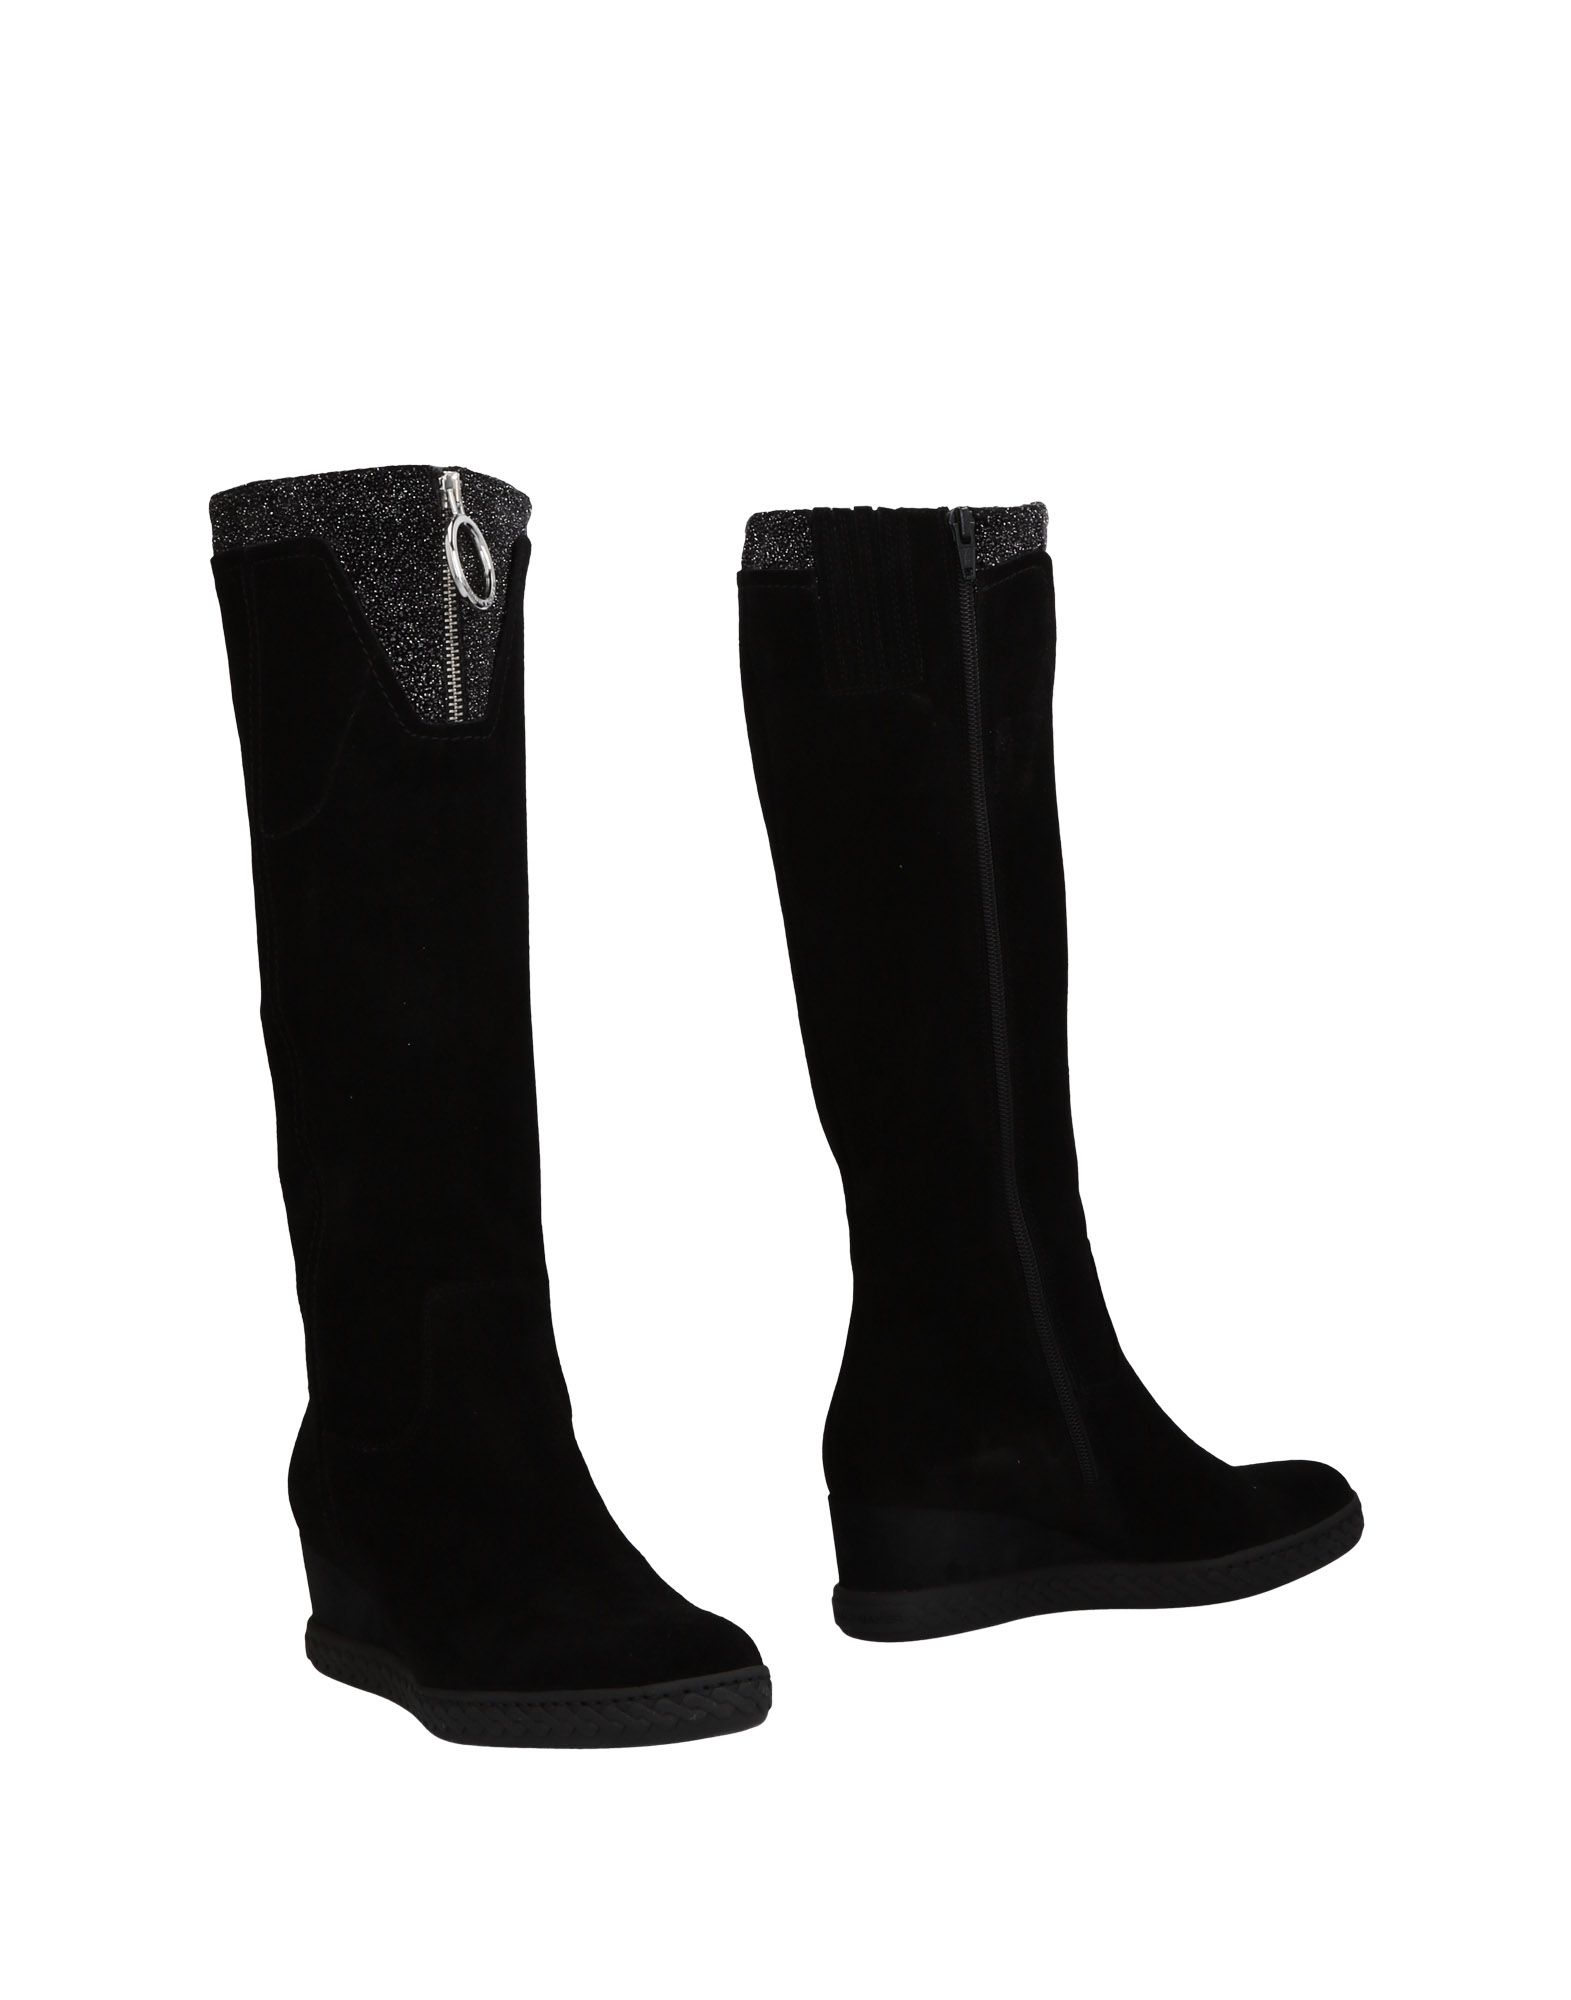 Rabatt Schuhe Stiefel Norma J.Baker Stiefel Schuhe Damen  11477021FM 086c30